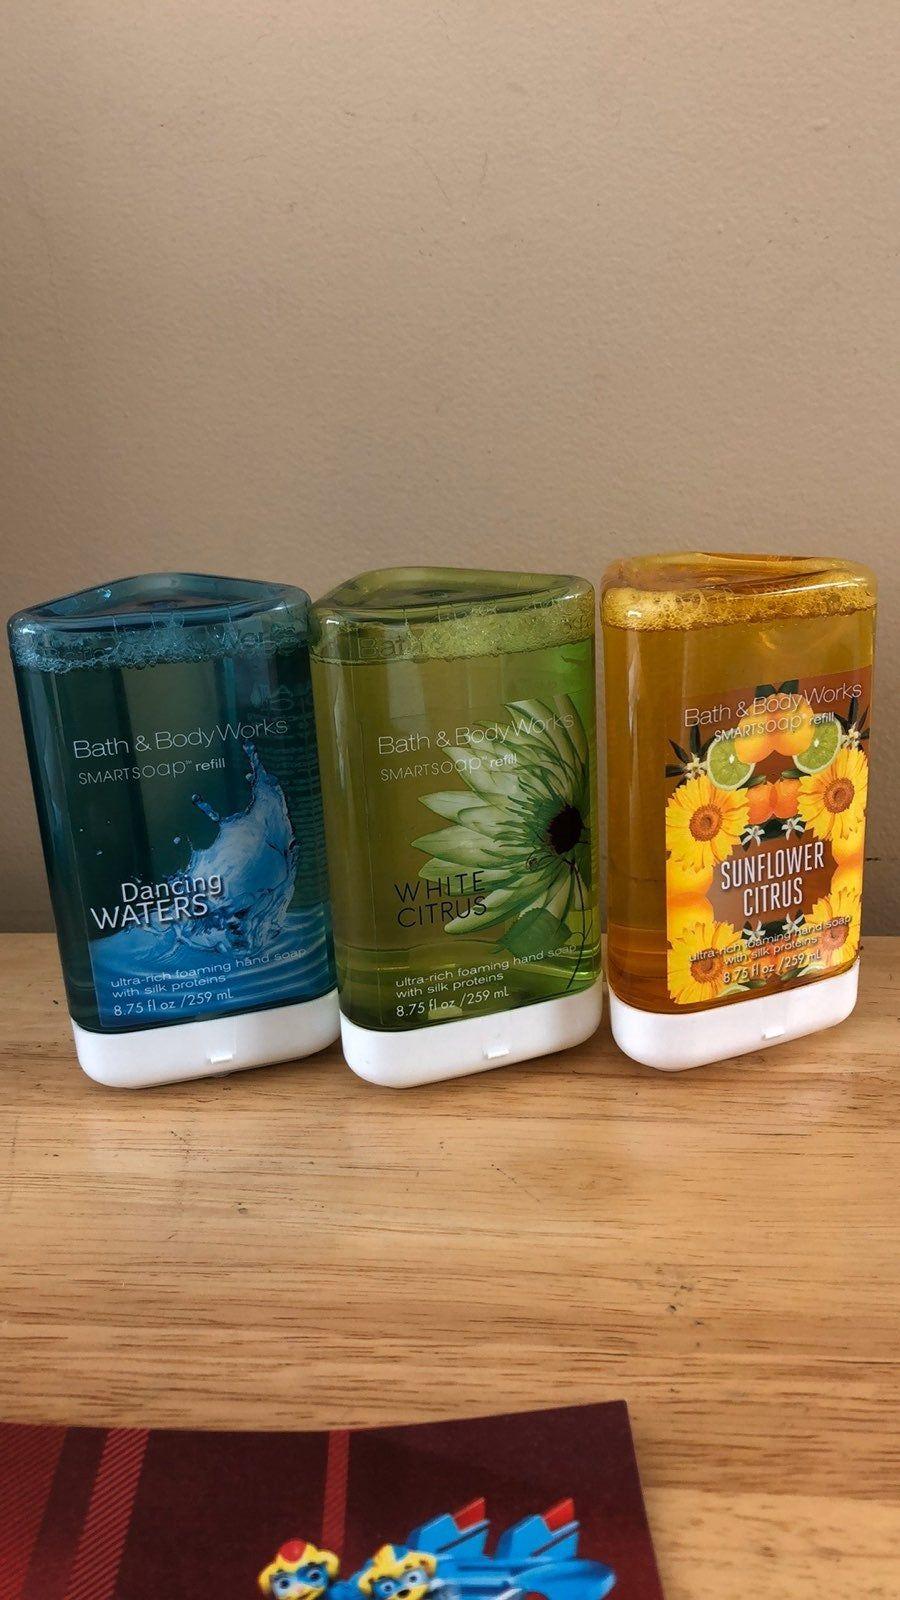 Nwt Bath Body Works Smart Soap Refills 3 Count Sunflower Citrus White Citrus Dancing Waters Bath And Body Works Bath And Body Body Works